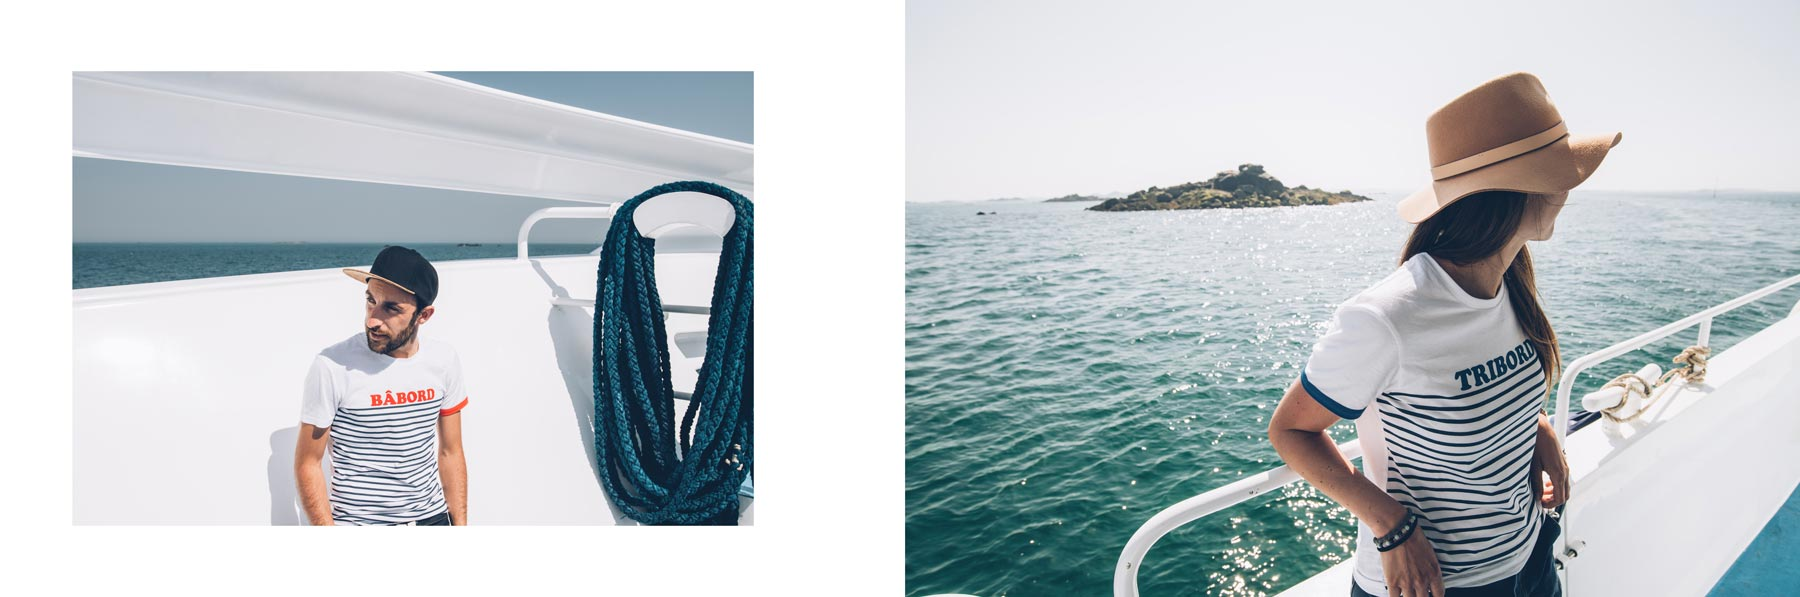 Ferry pour les Iles Chausey